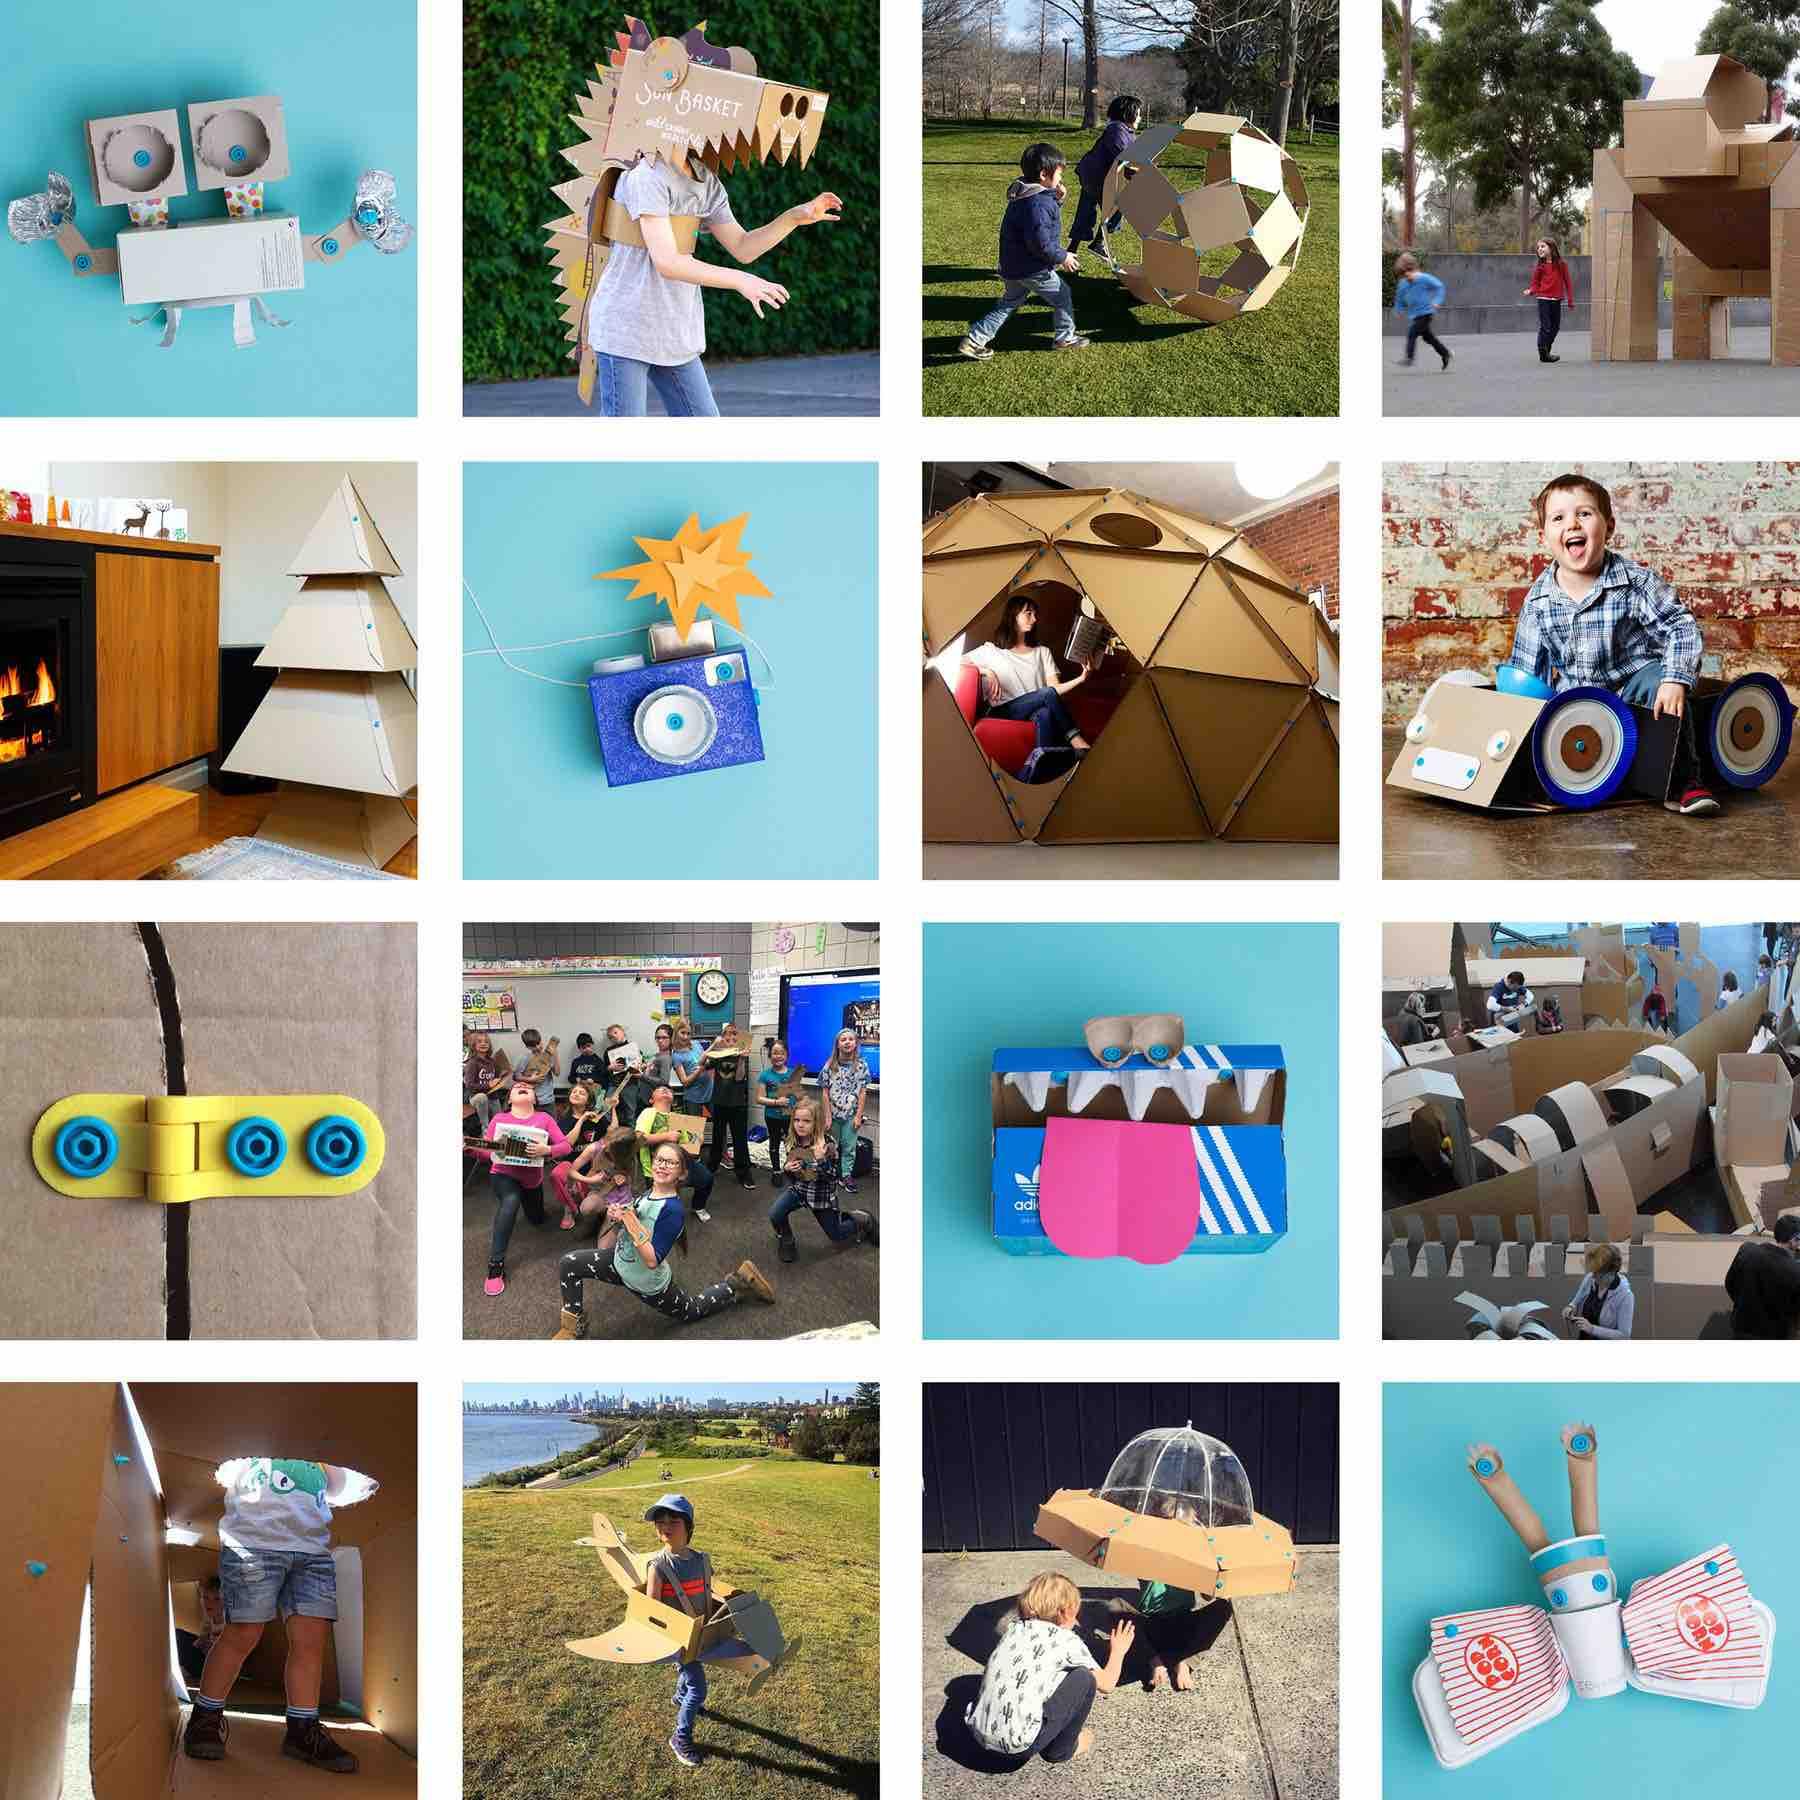 makedo-cardboard-construction-tool-kits-ideas